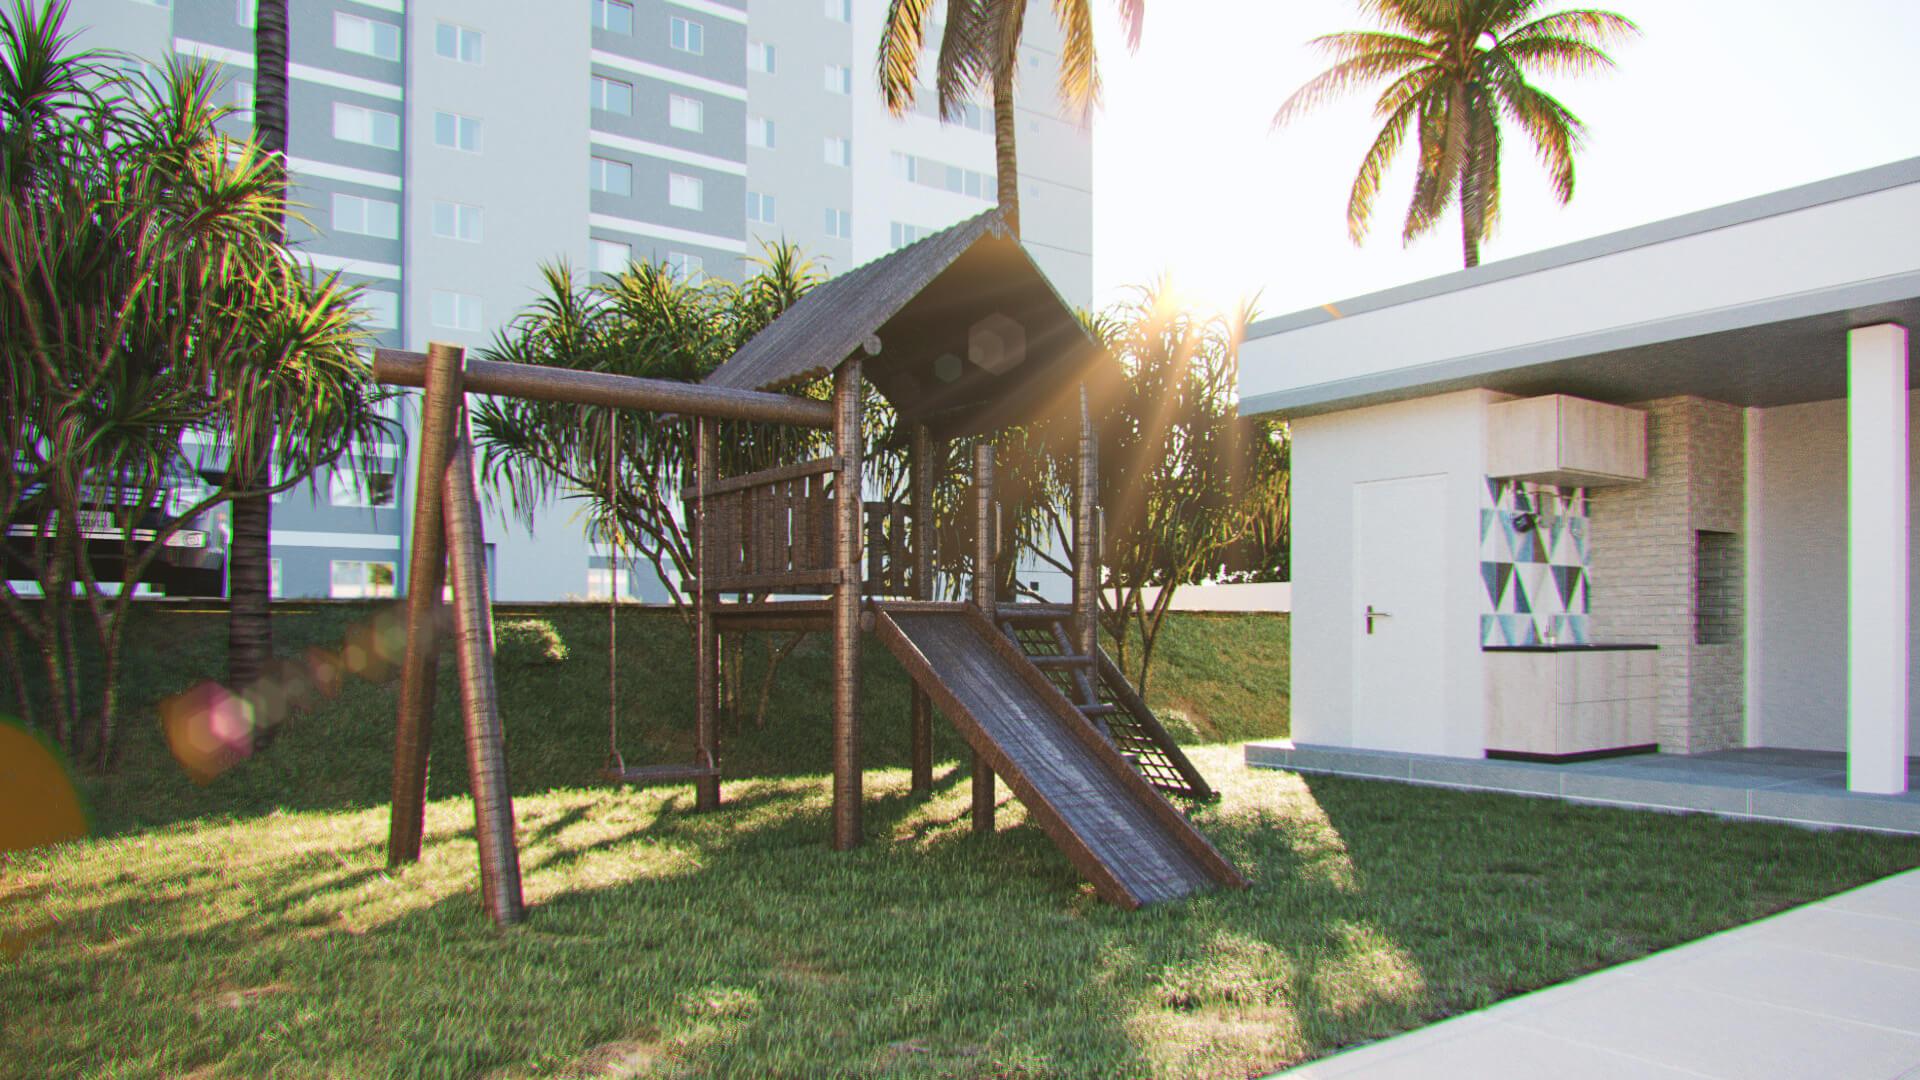 Playground - Reserva Bandeirantes